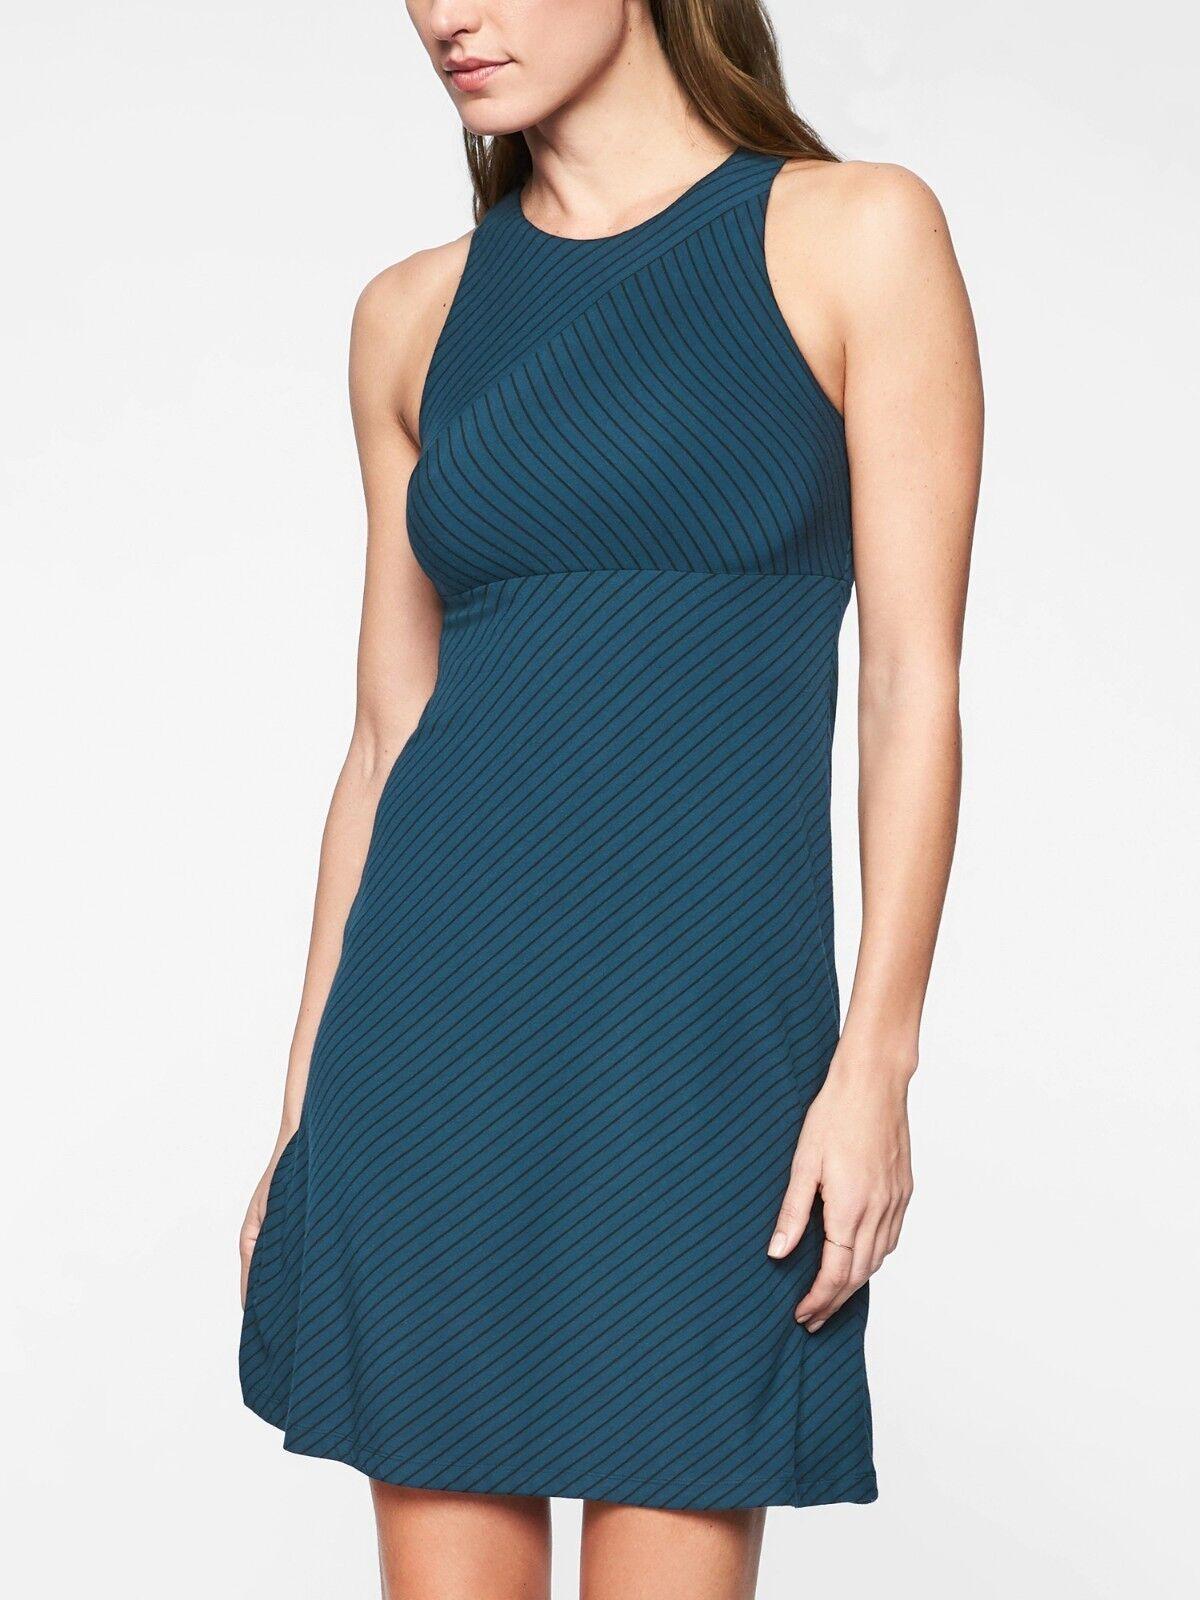 Athleta Santorini High Neck Mix Stripe Dress,Constellation Blau Größe L